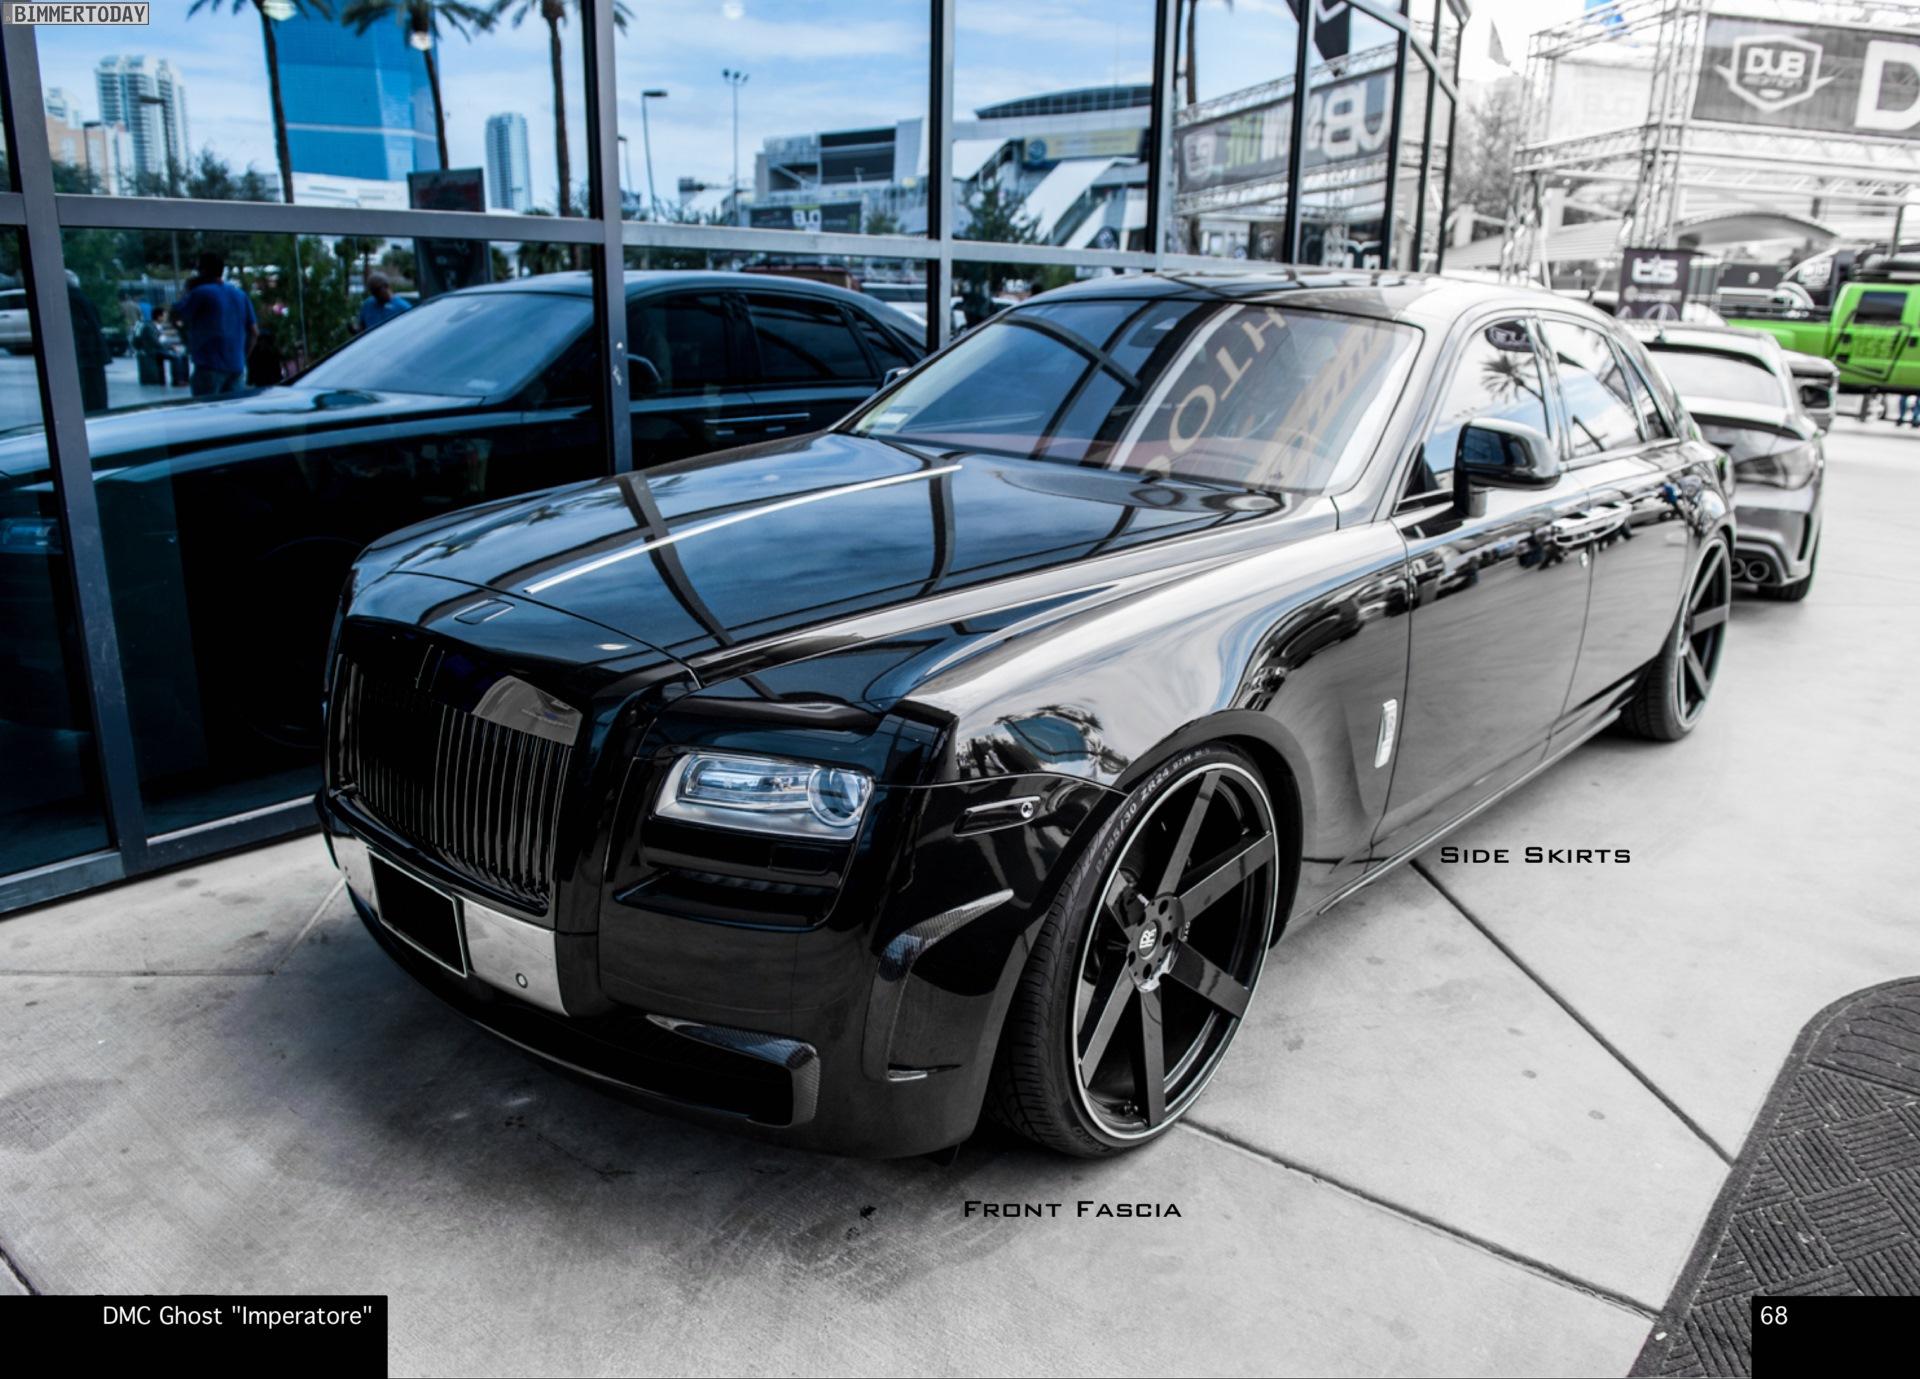 Dmc Luxury Rolls Royce Ghost Imperatore Tuning F 252 R Mehr